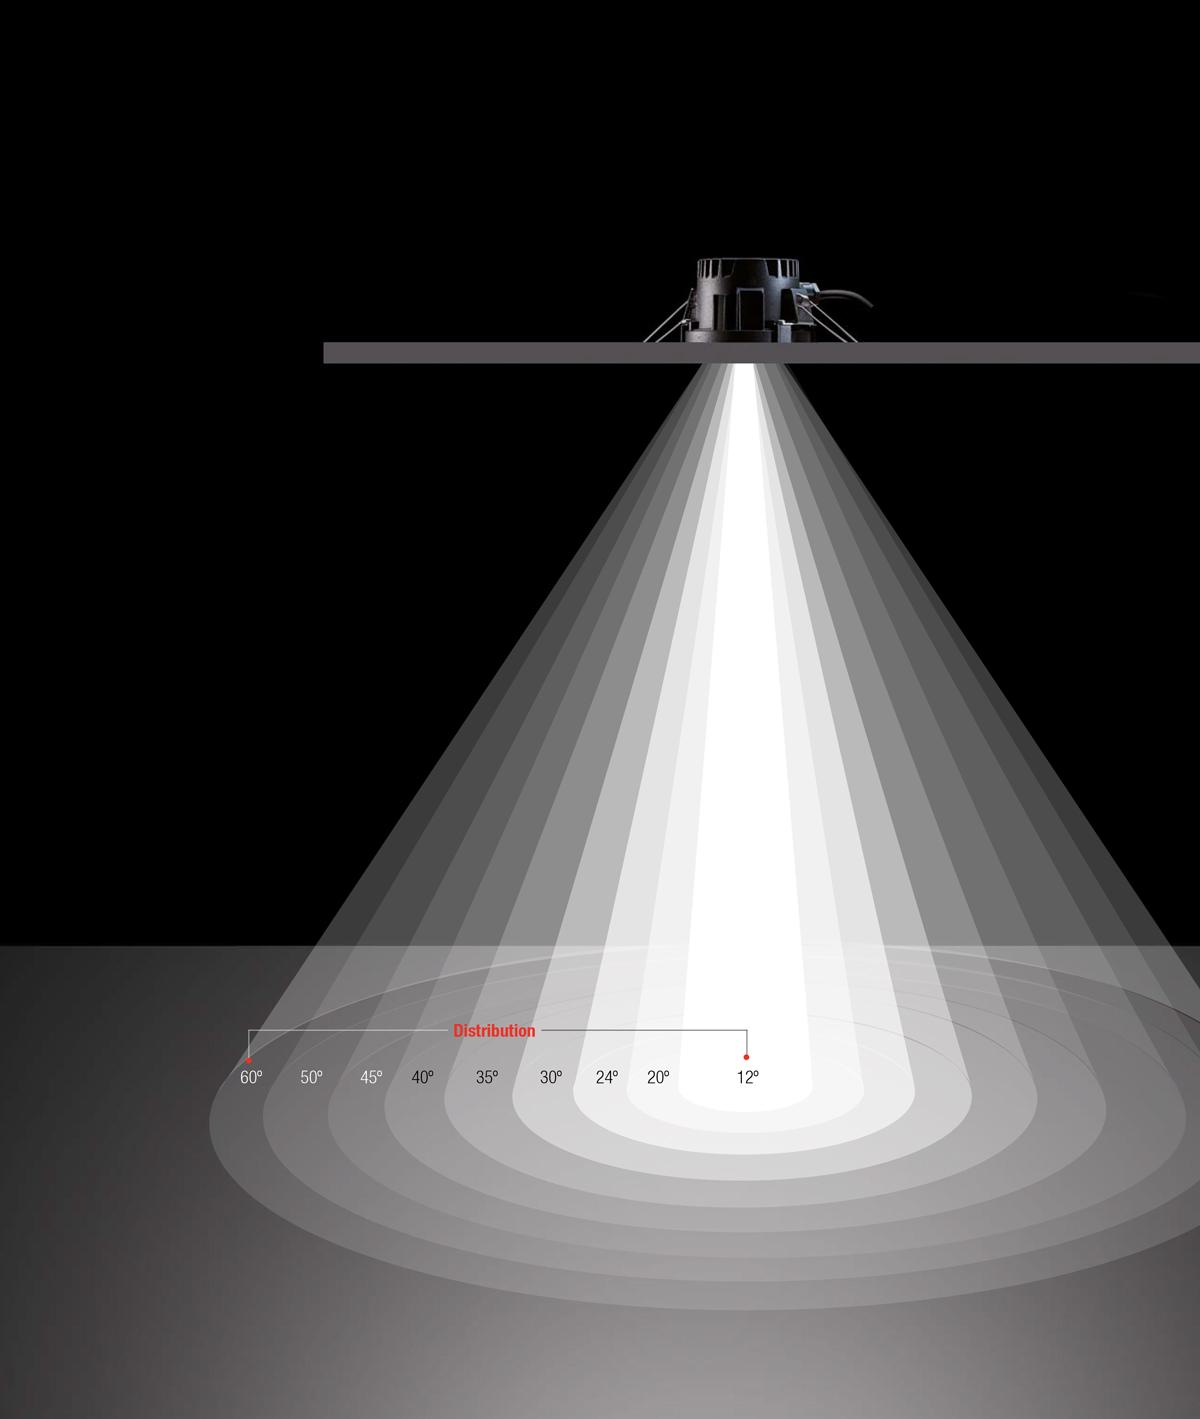 LED downlight beam angles